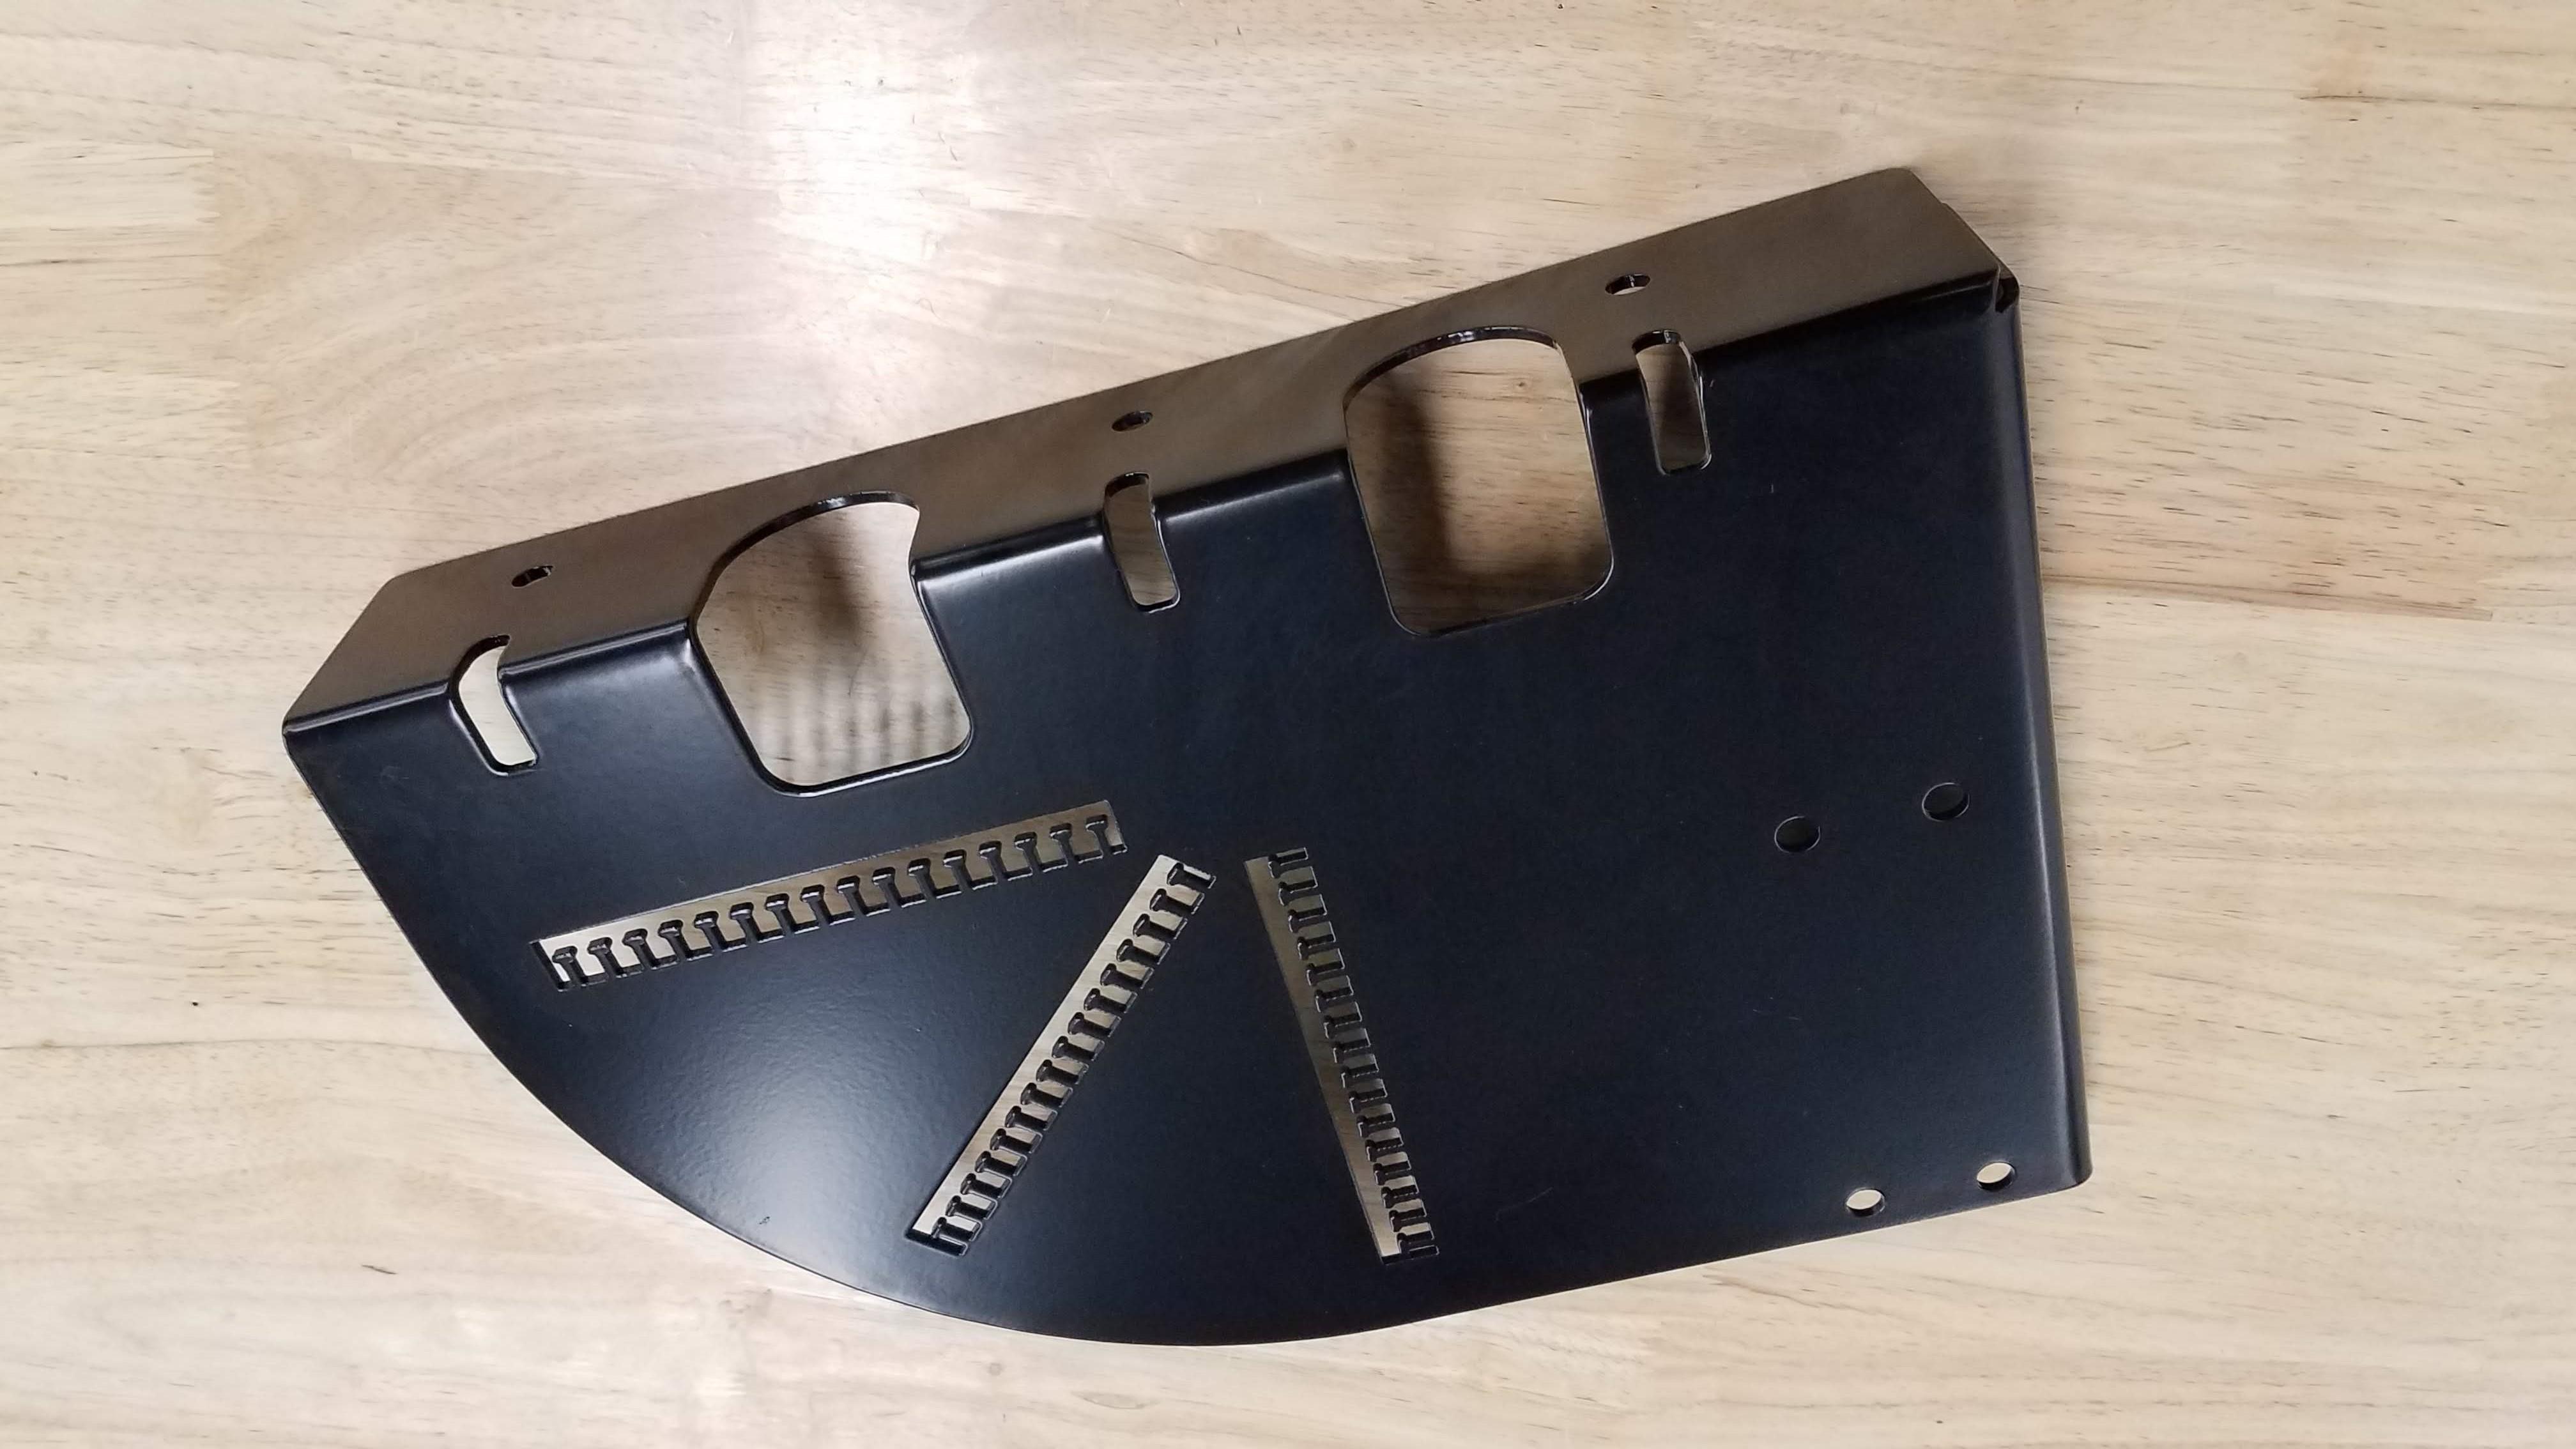 PC panel